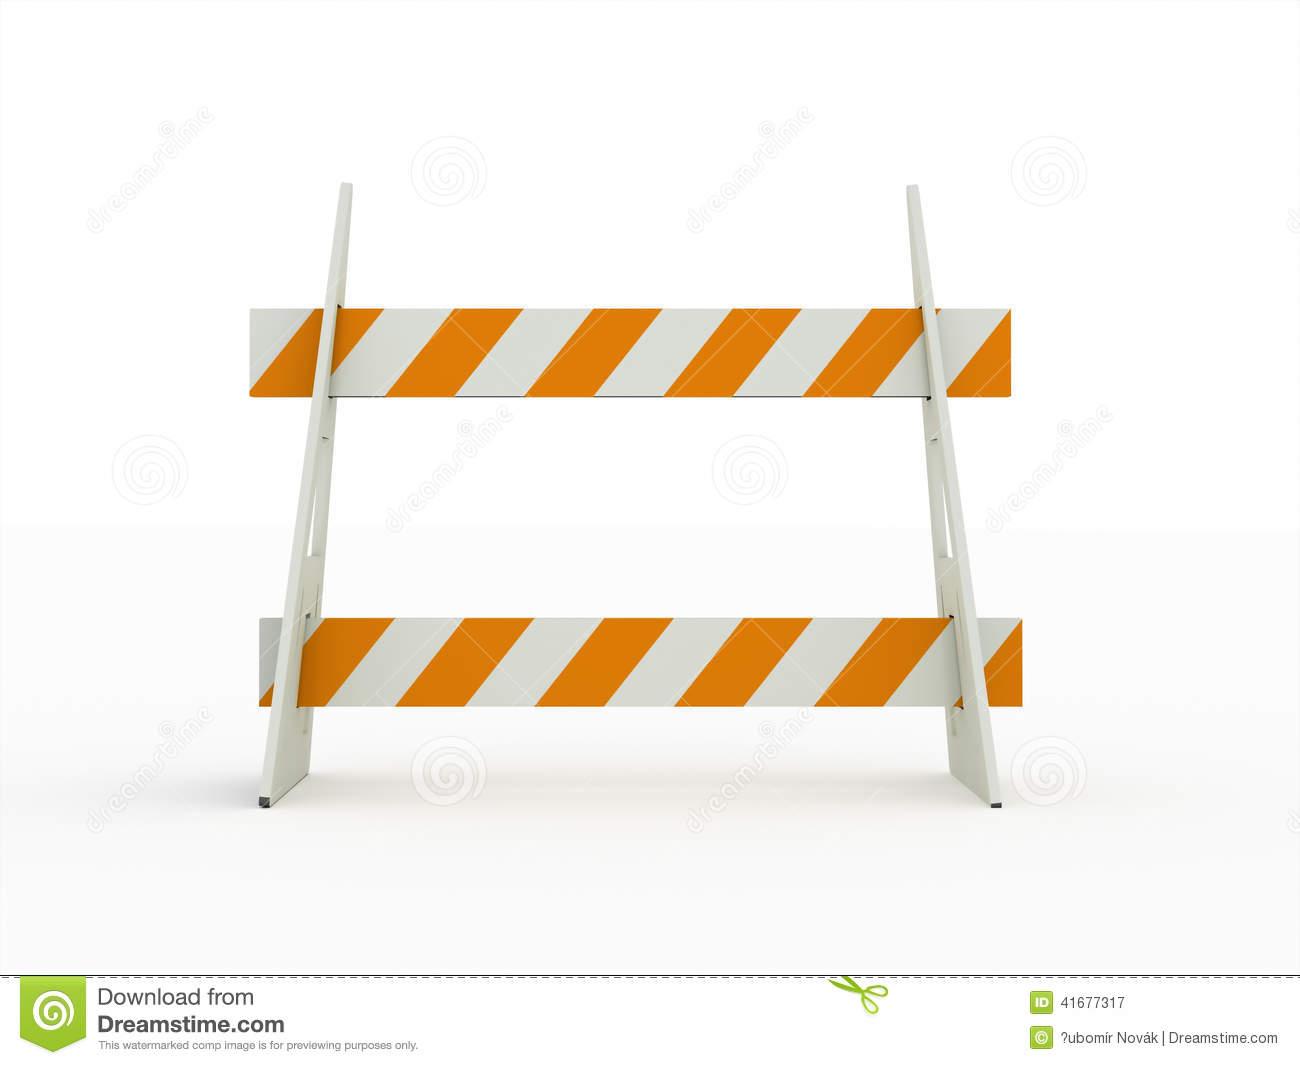 Construction road block clipart no background.